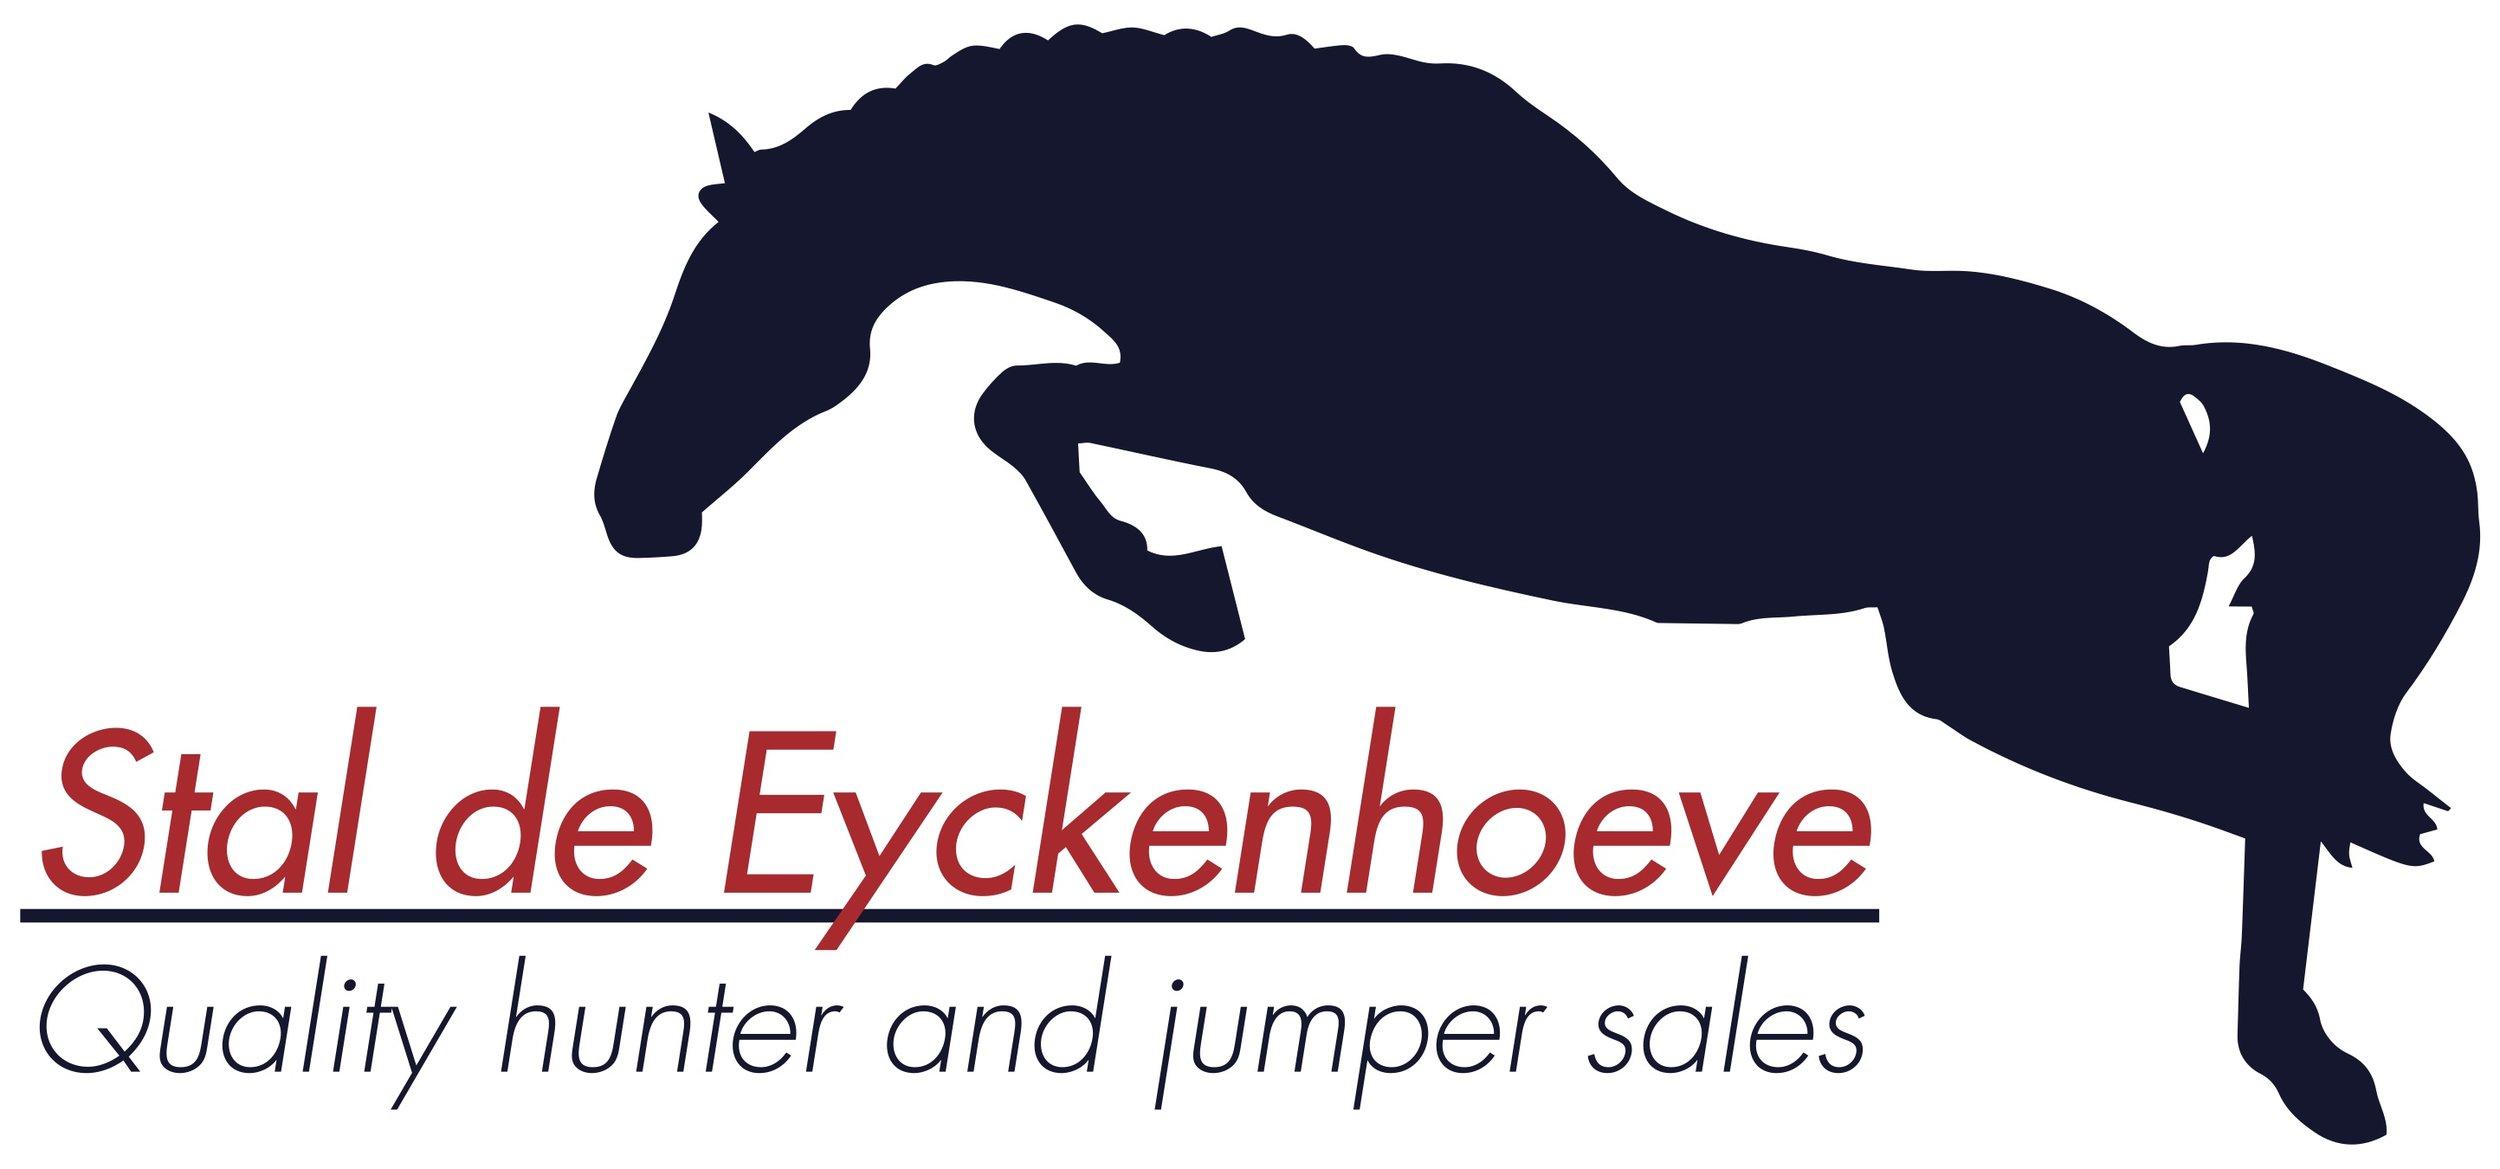 StaldeEyckenhoeve_Logo_Outline.jpg